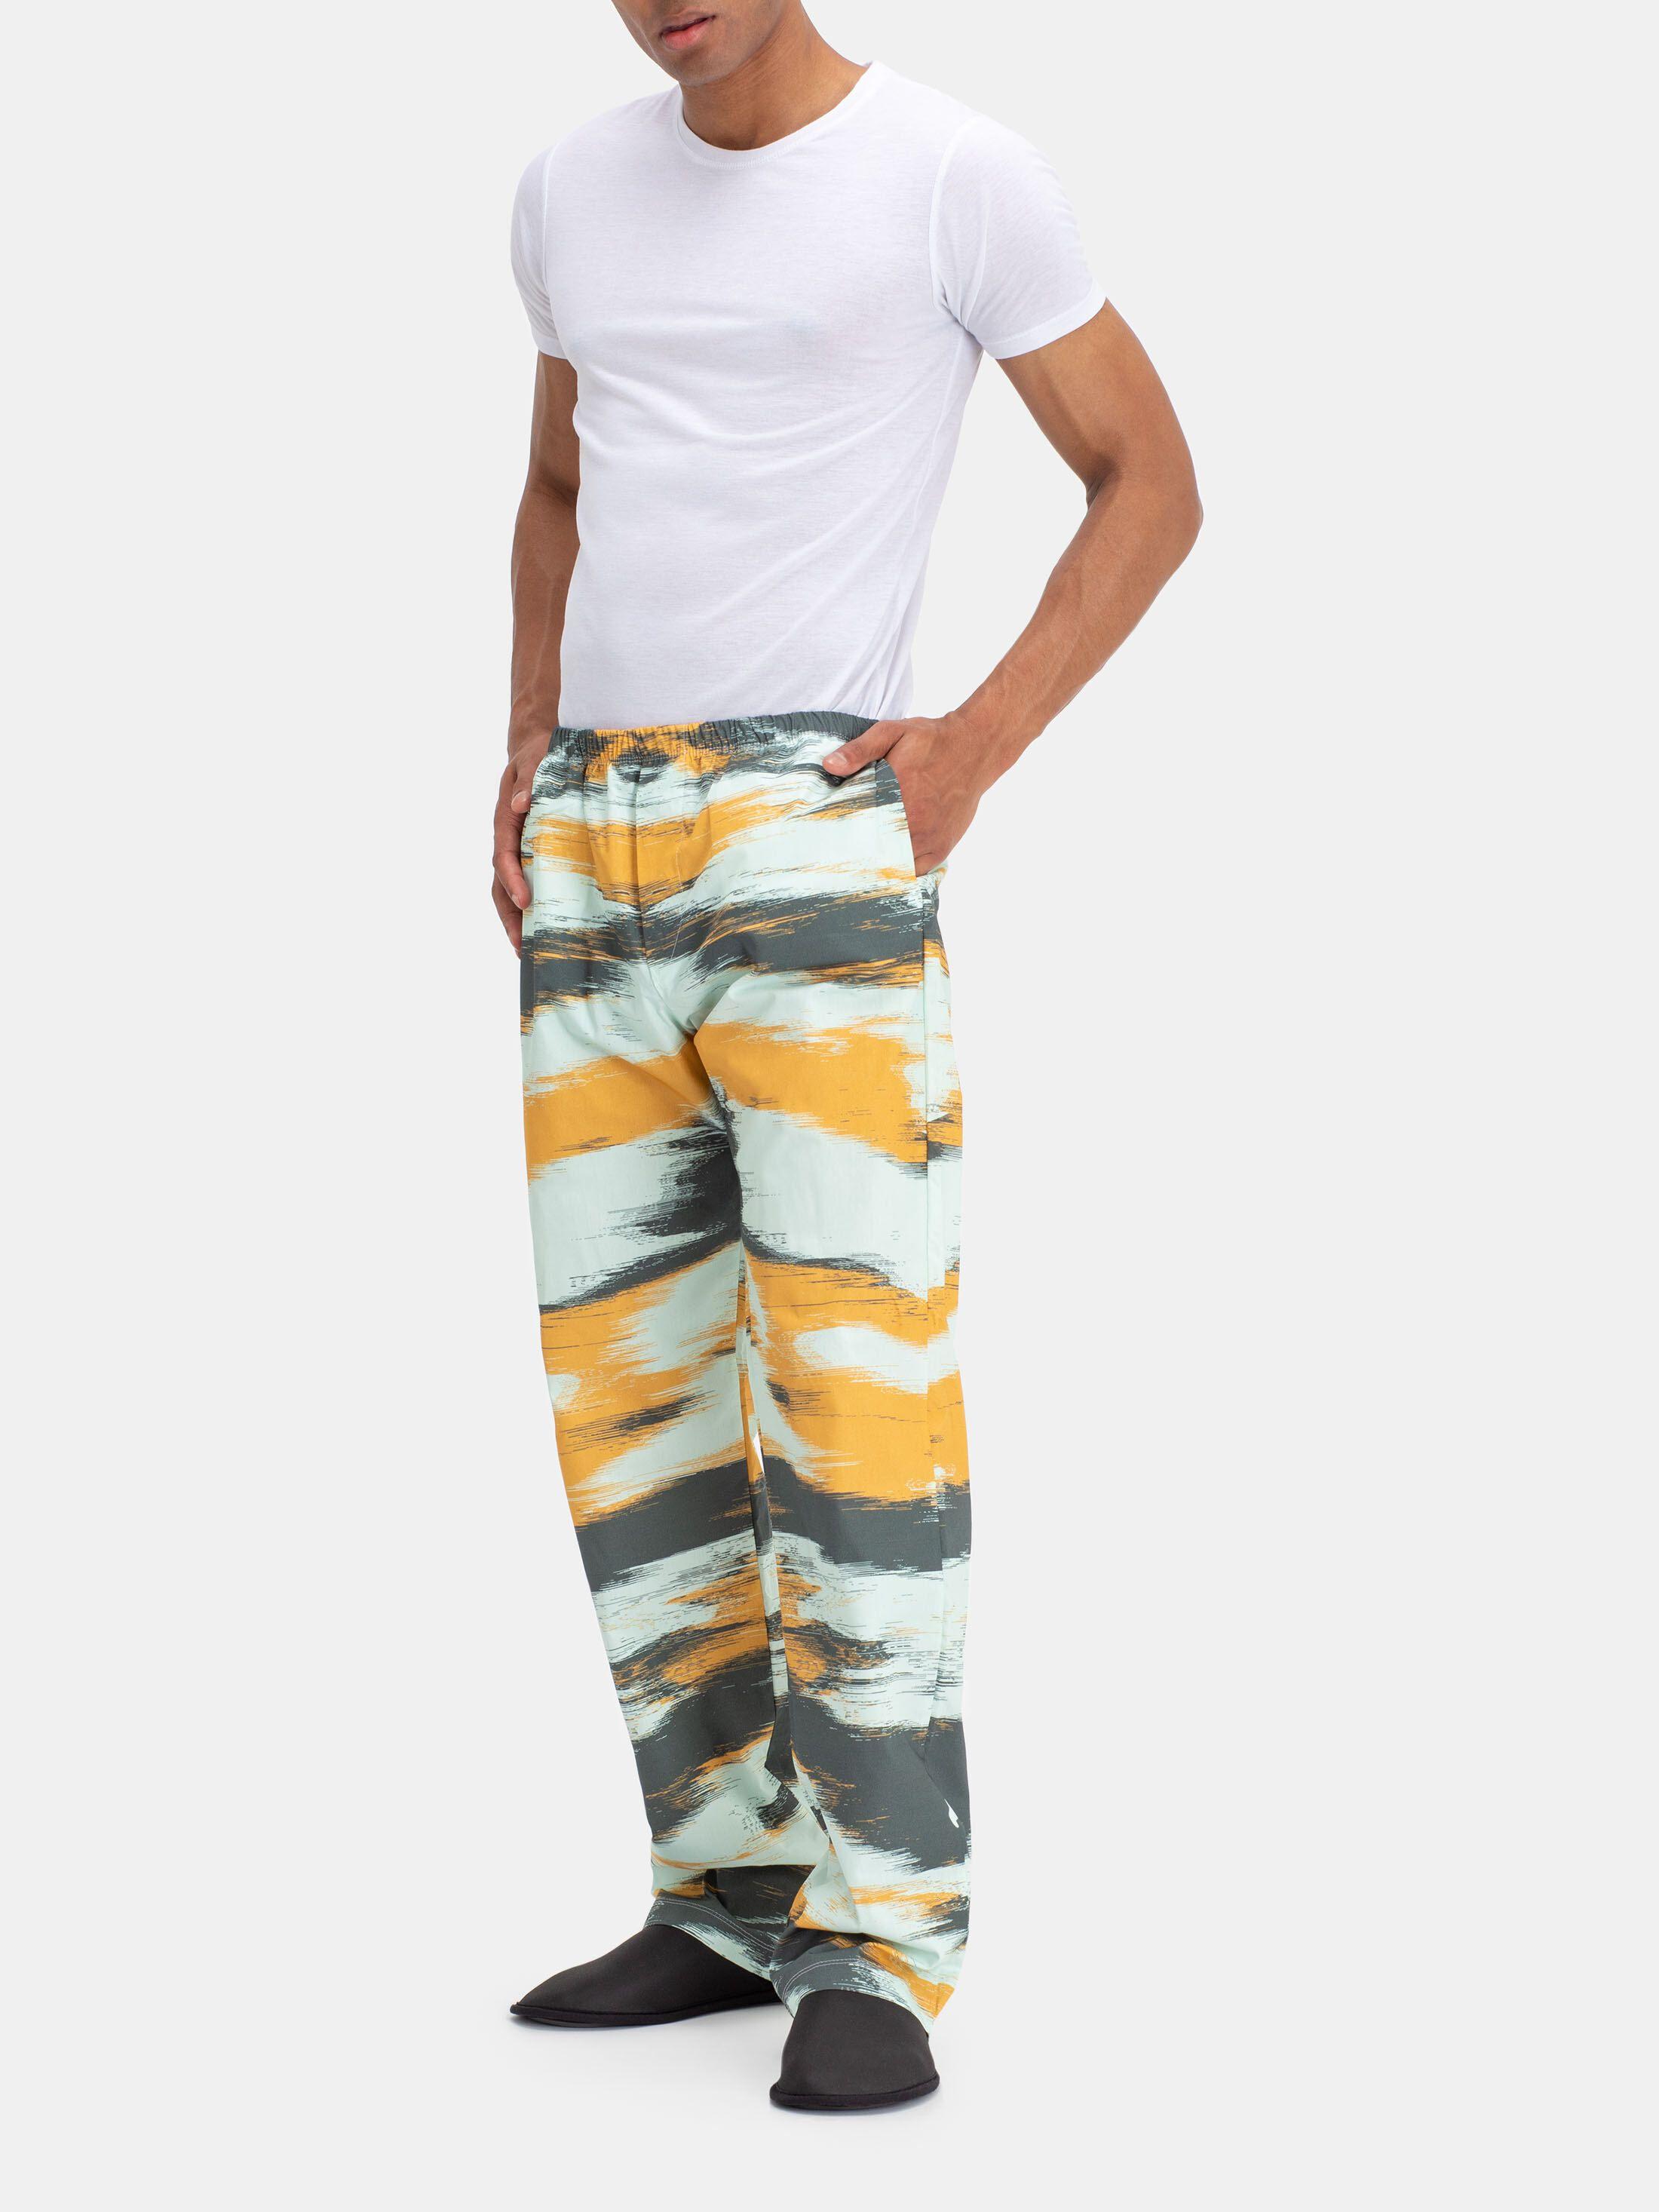 Personalised Cotton Pyjama bottoms